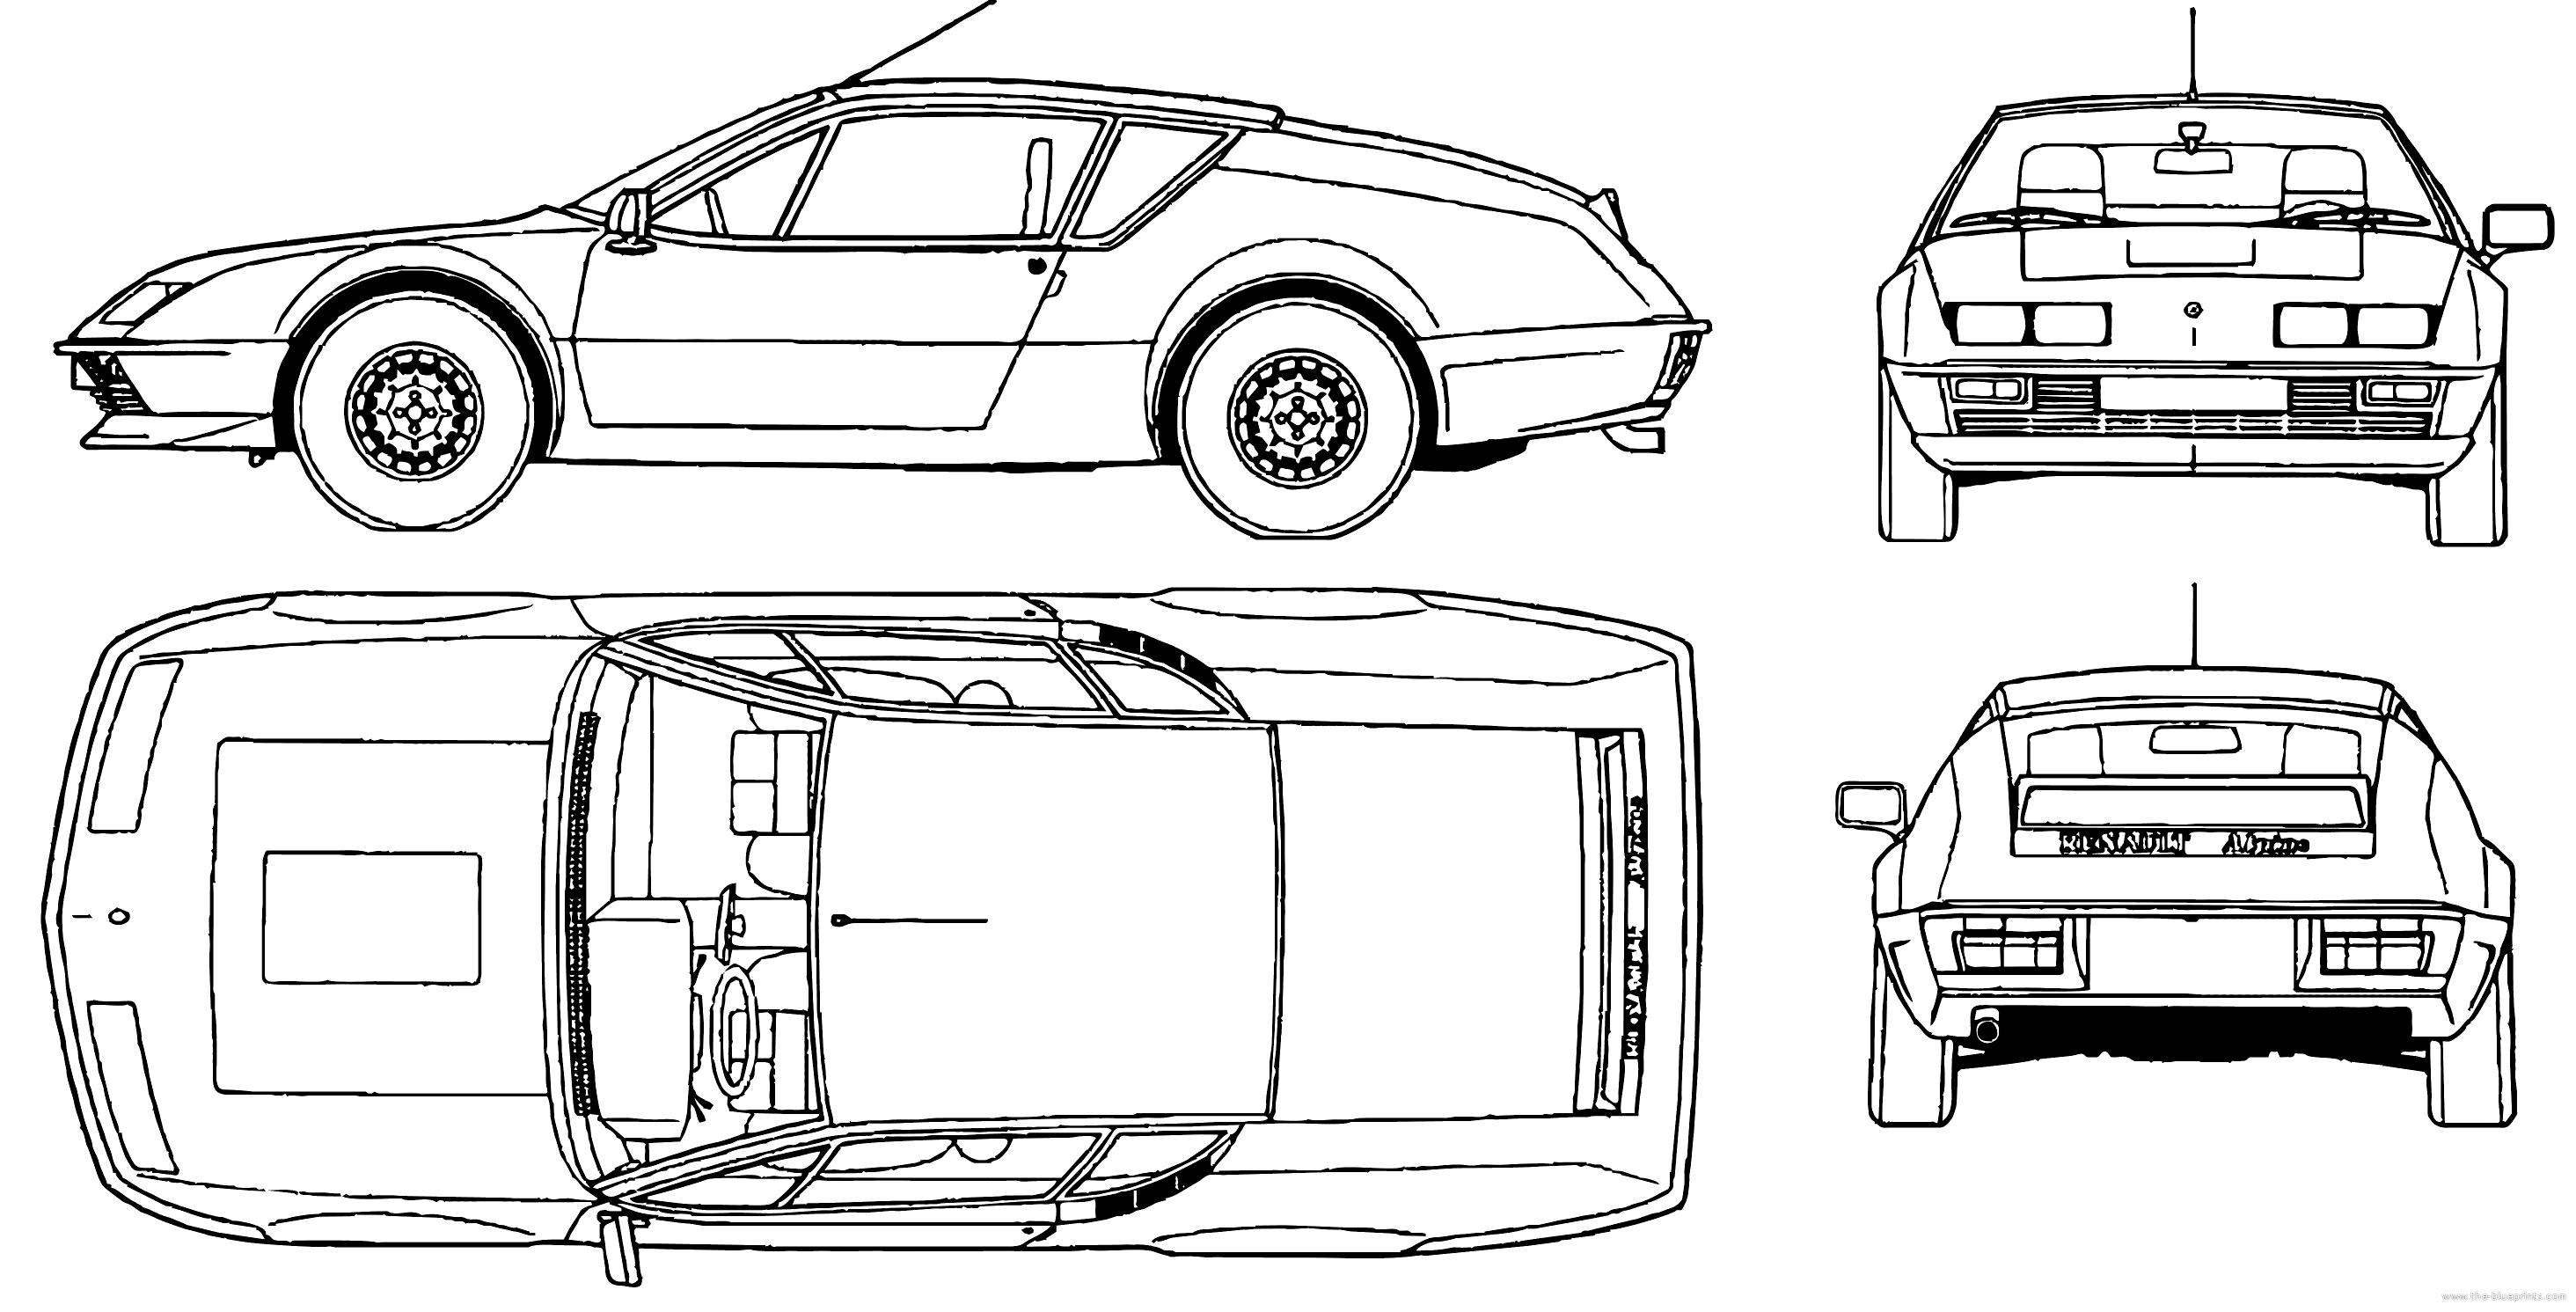 blueprints  u0026gt  cars  u0026gt  renault  u0026gt  renault alpine a310 v6  1977